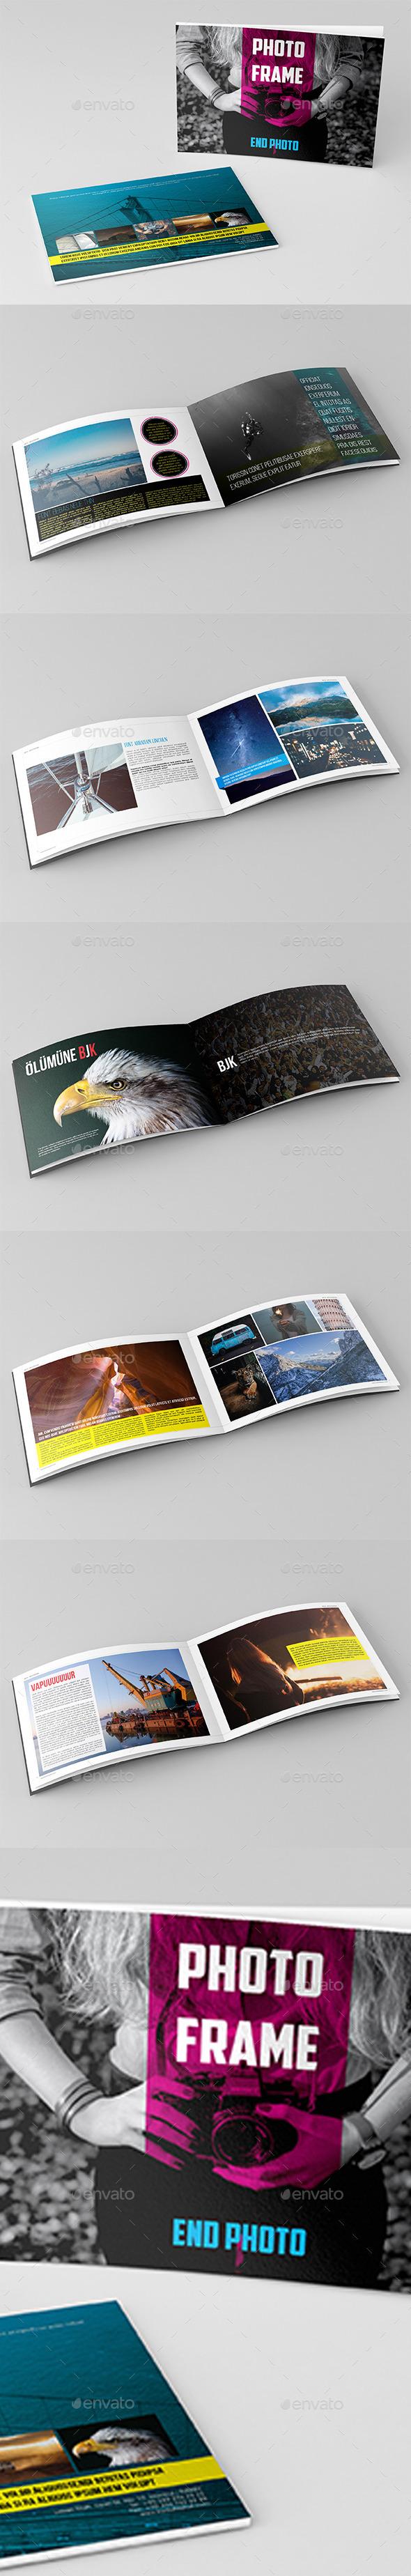 GraphicRiver Photo Catalog Template 10985880